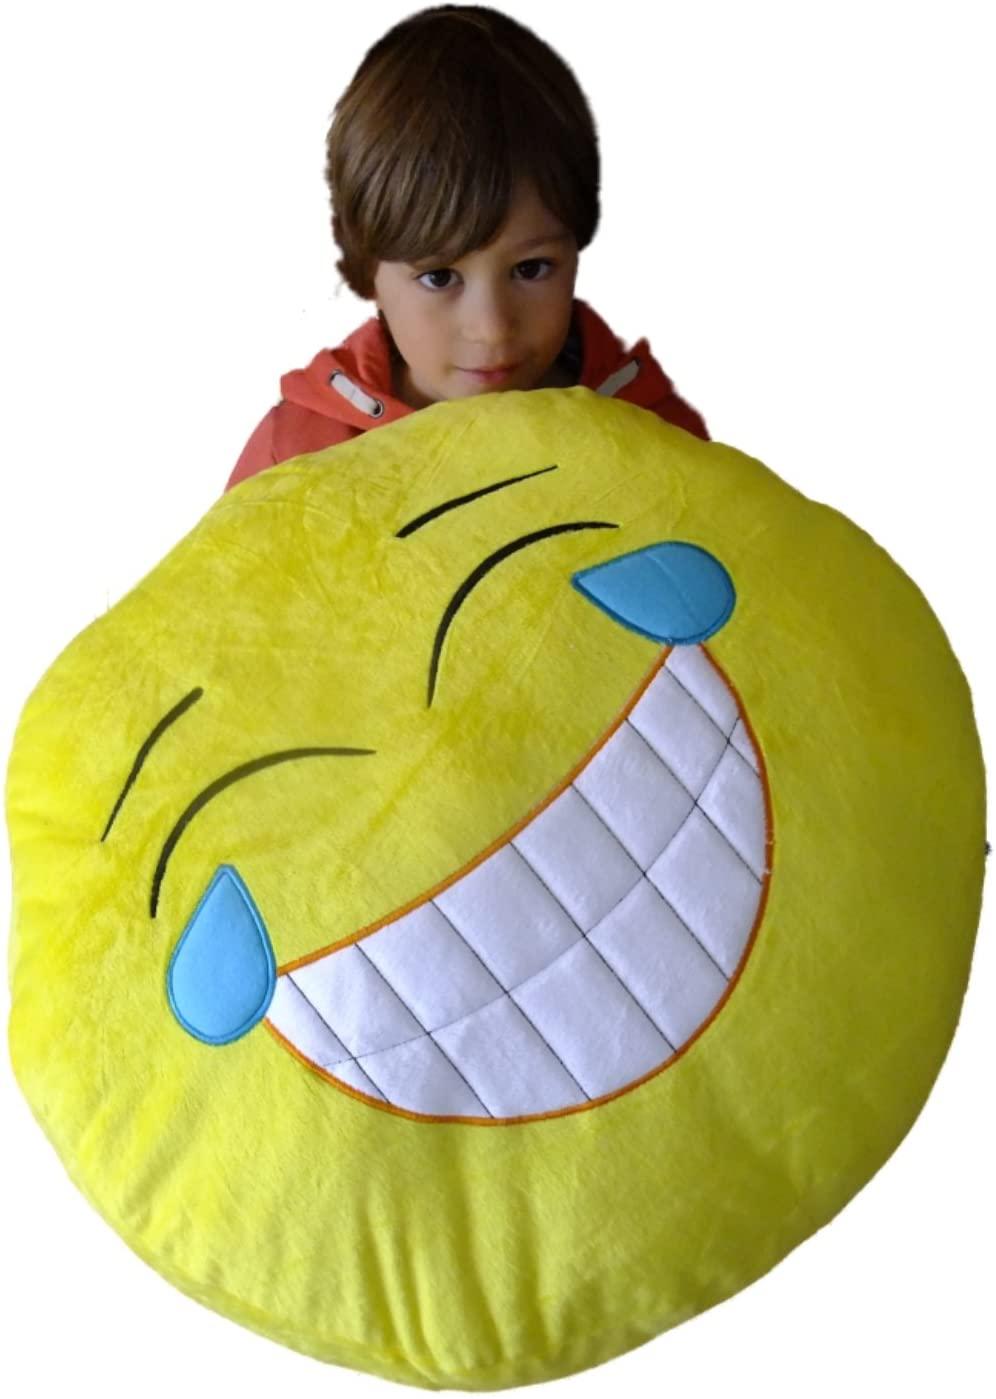 Emoticons Huge Giant Massive Goofy Emoji Cushion Pillow 50cm 20